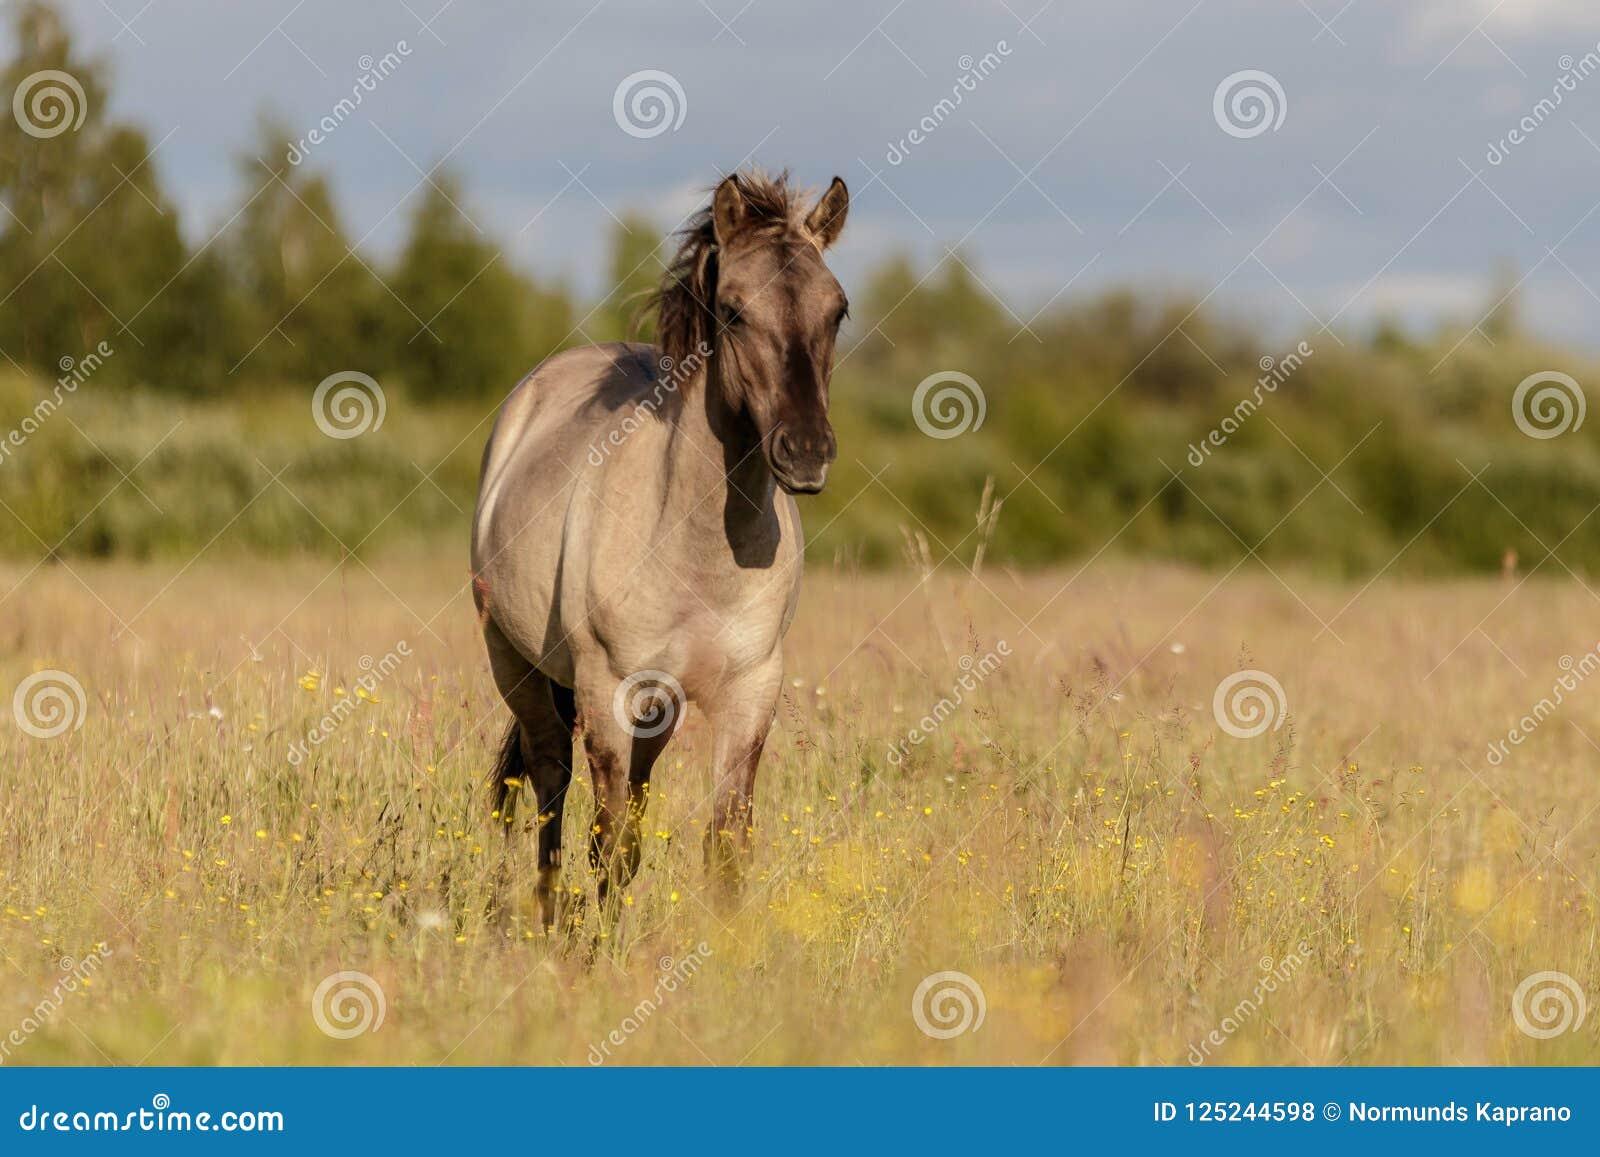 Beautiful Wild Horses In Grazing Stock Photo Image Of Beautiful Countryside 125244598